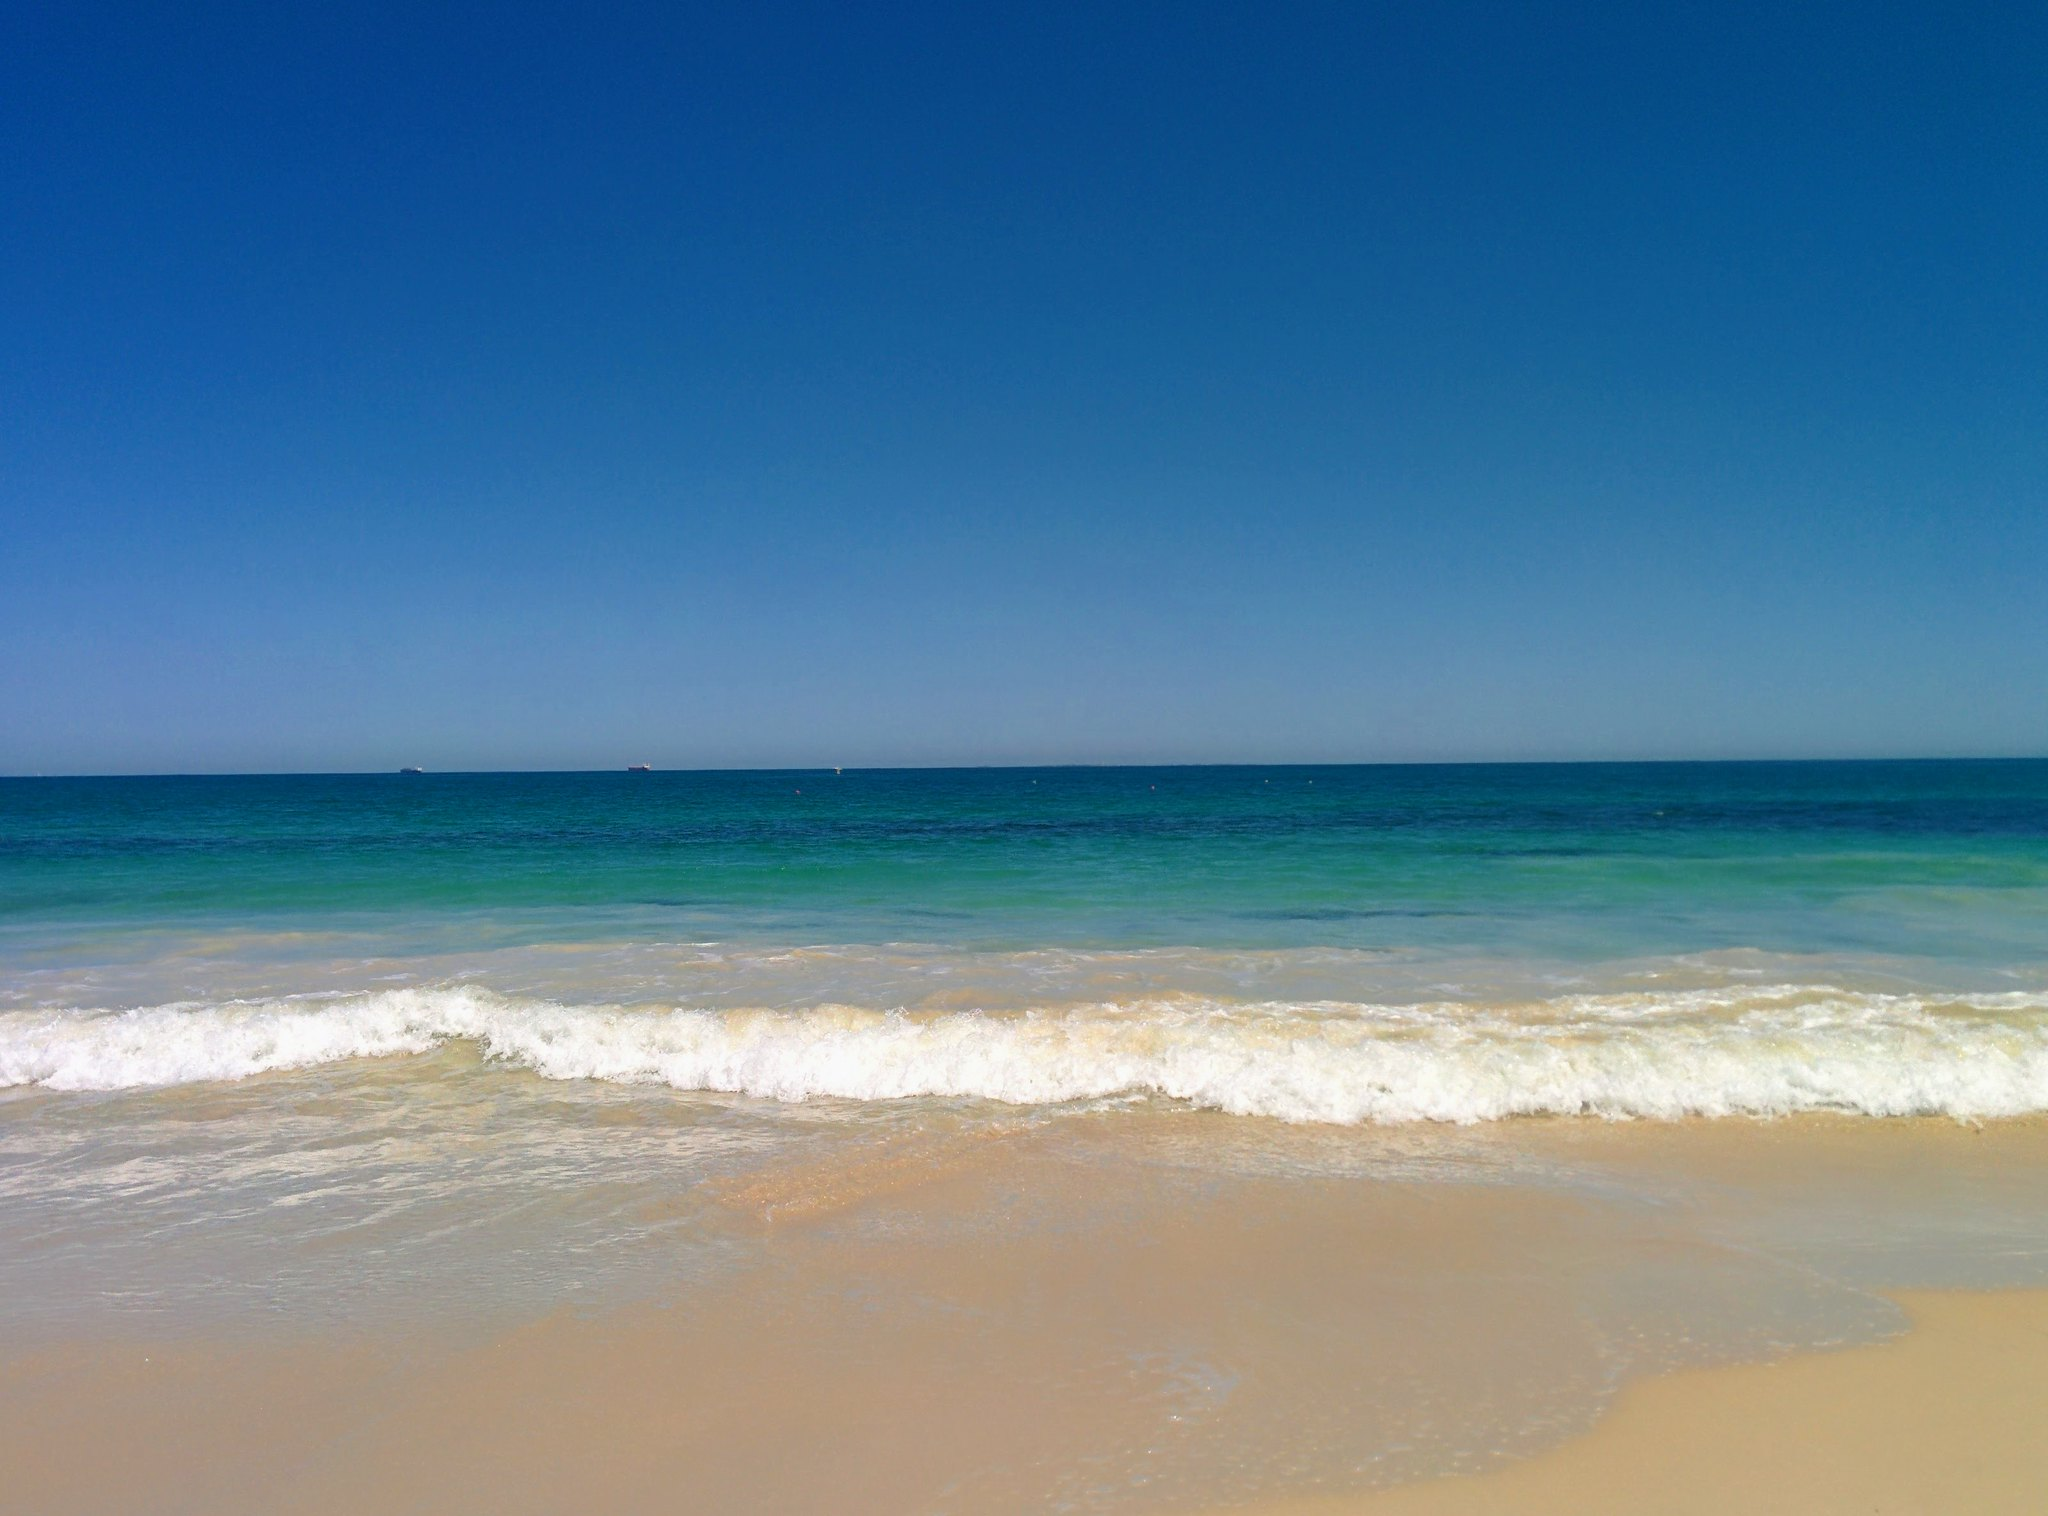 The surf along Cottesloe beach